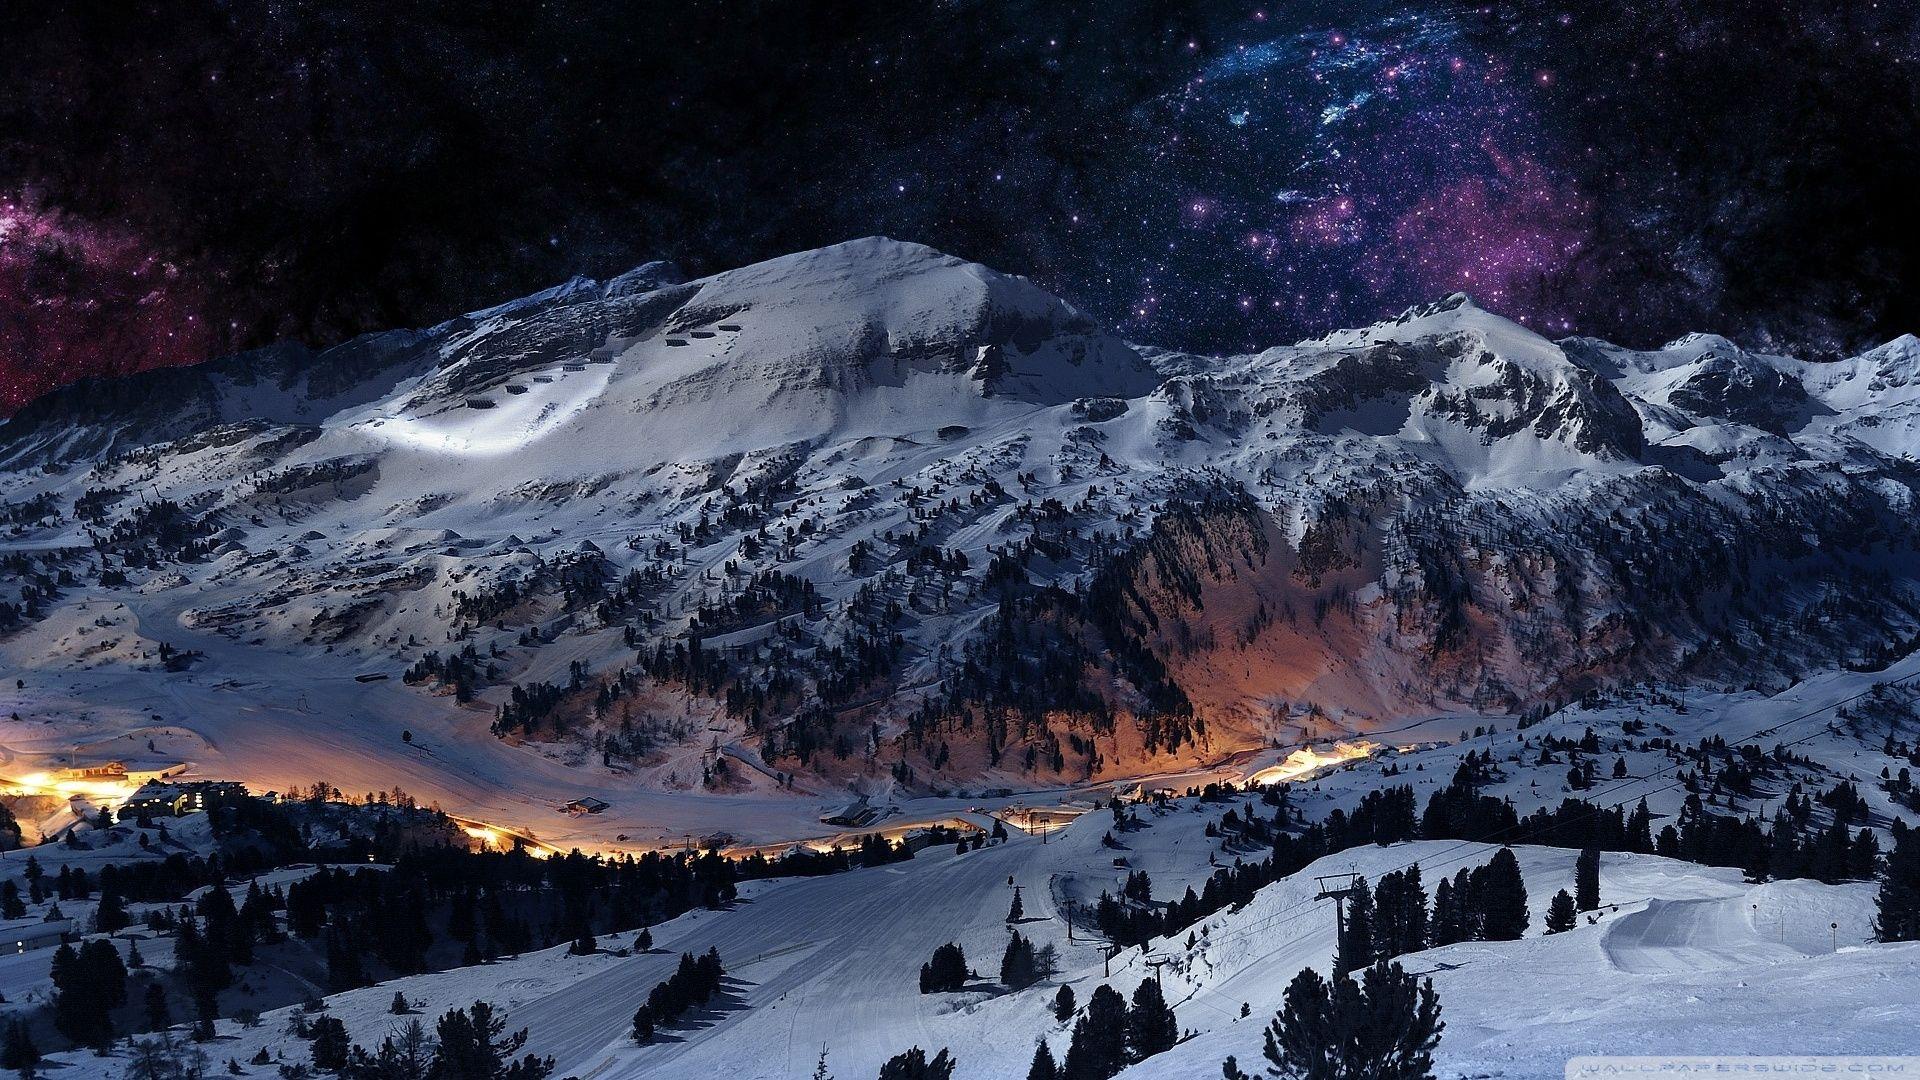 Night Sky Snow Wallpaper Reviews News Tips And Tricks Winter Wallpaper Hd Mountain Wallpaper Mountains At Night